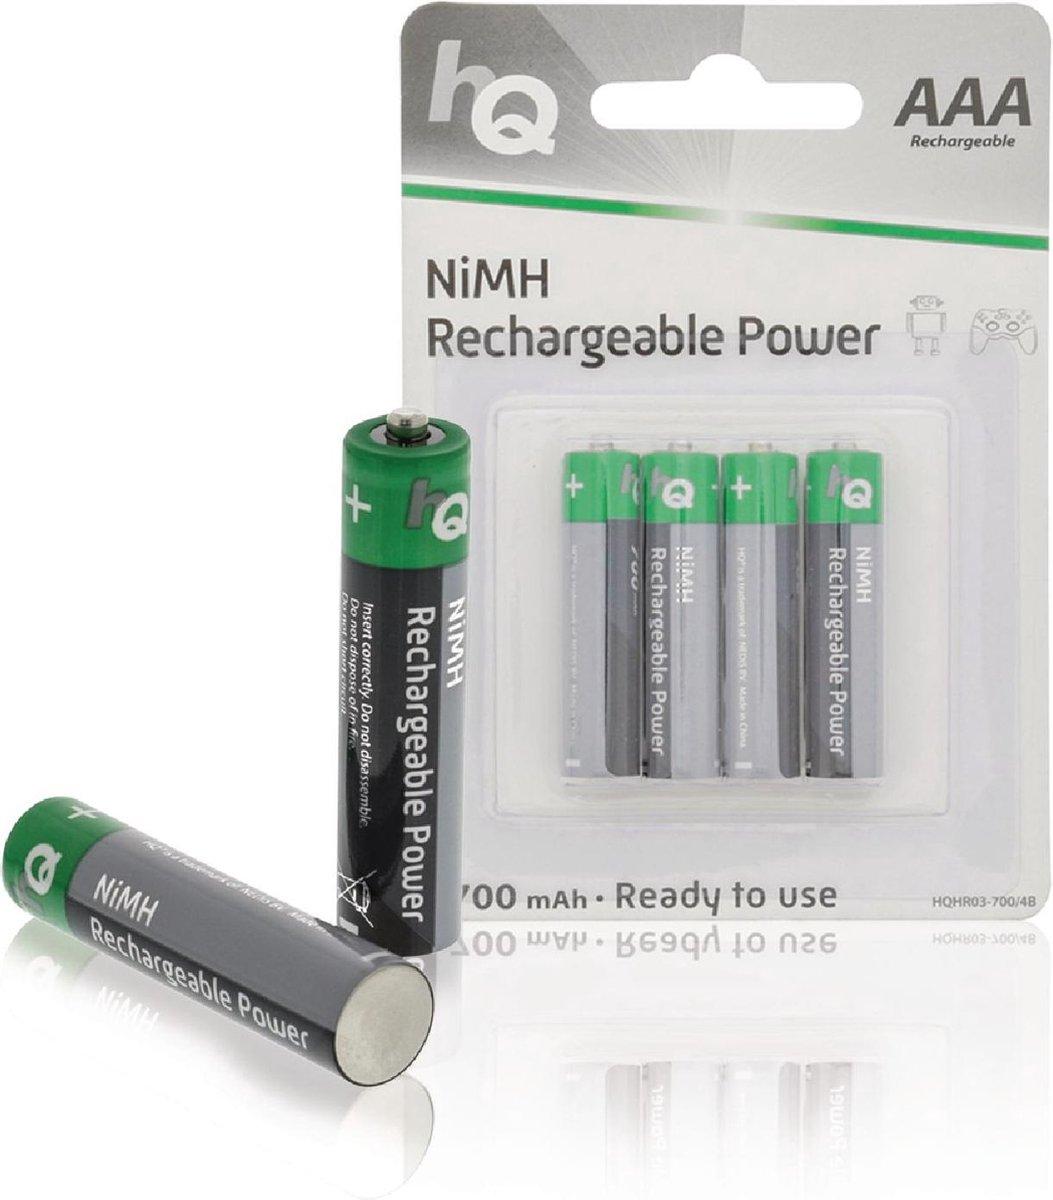 HQ, Oplaadbare NiMH AAA -Batterij 700 mAh, blister 4 stuks - HQ